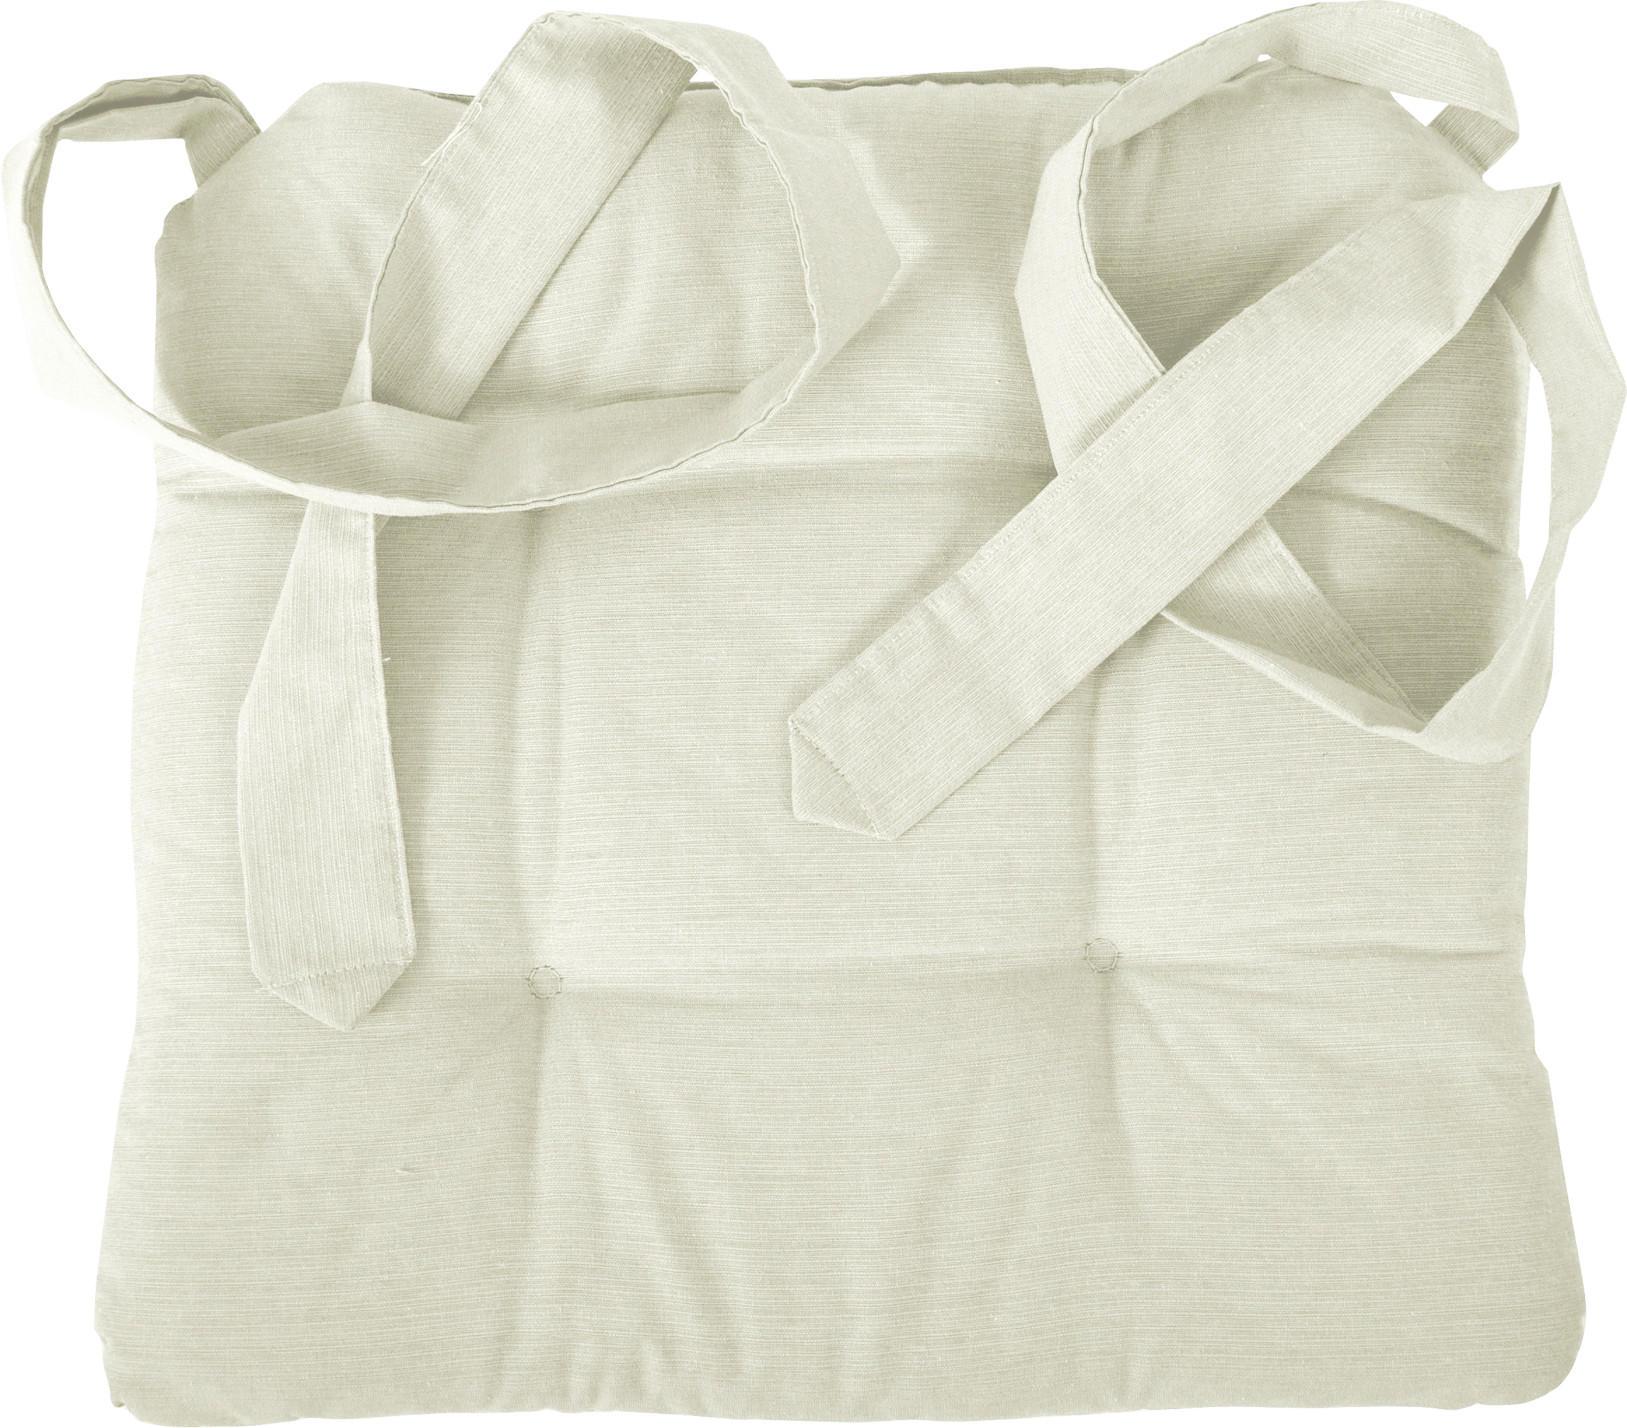 STUHLKISSEN Creme 42/46/7 cm - Creme, Textil (42/46/7cm) - NOVEL